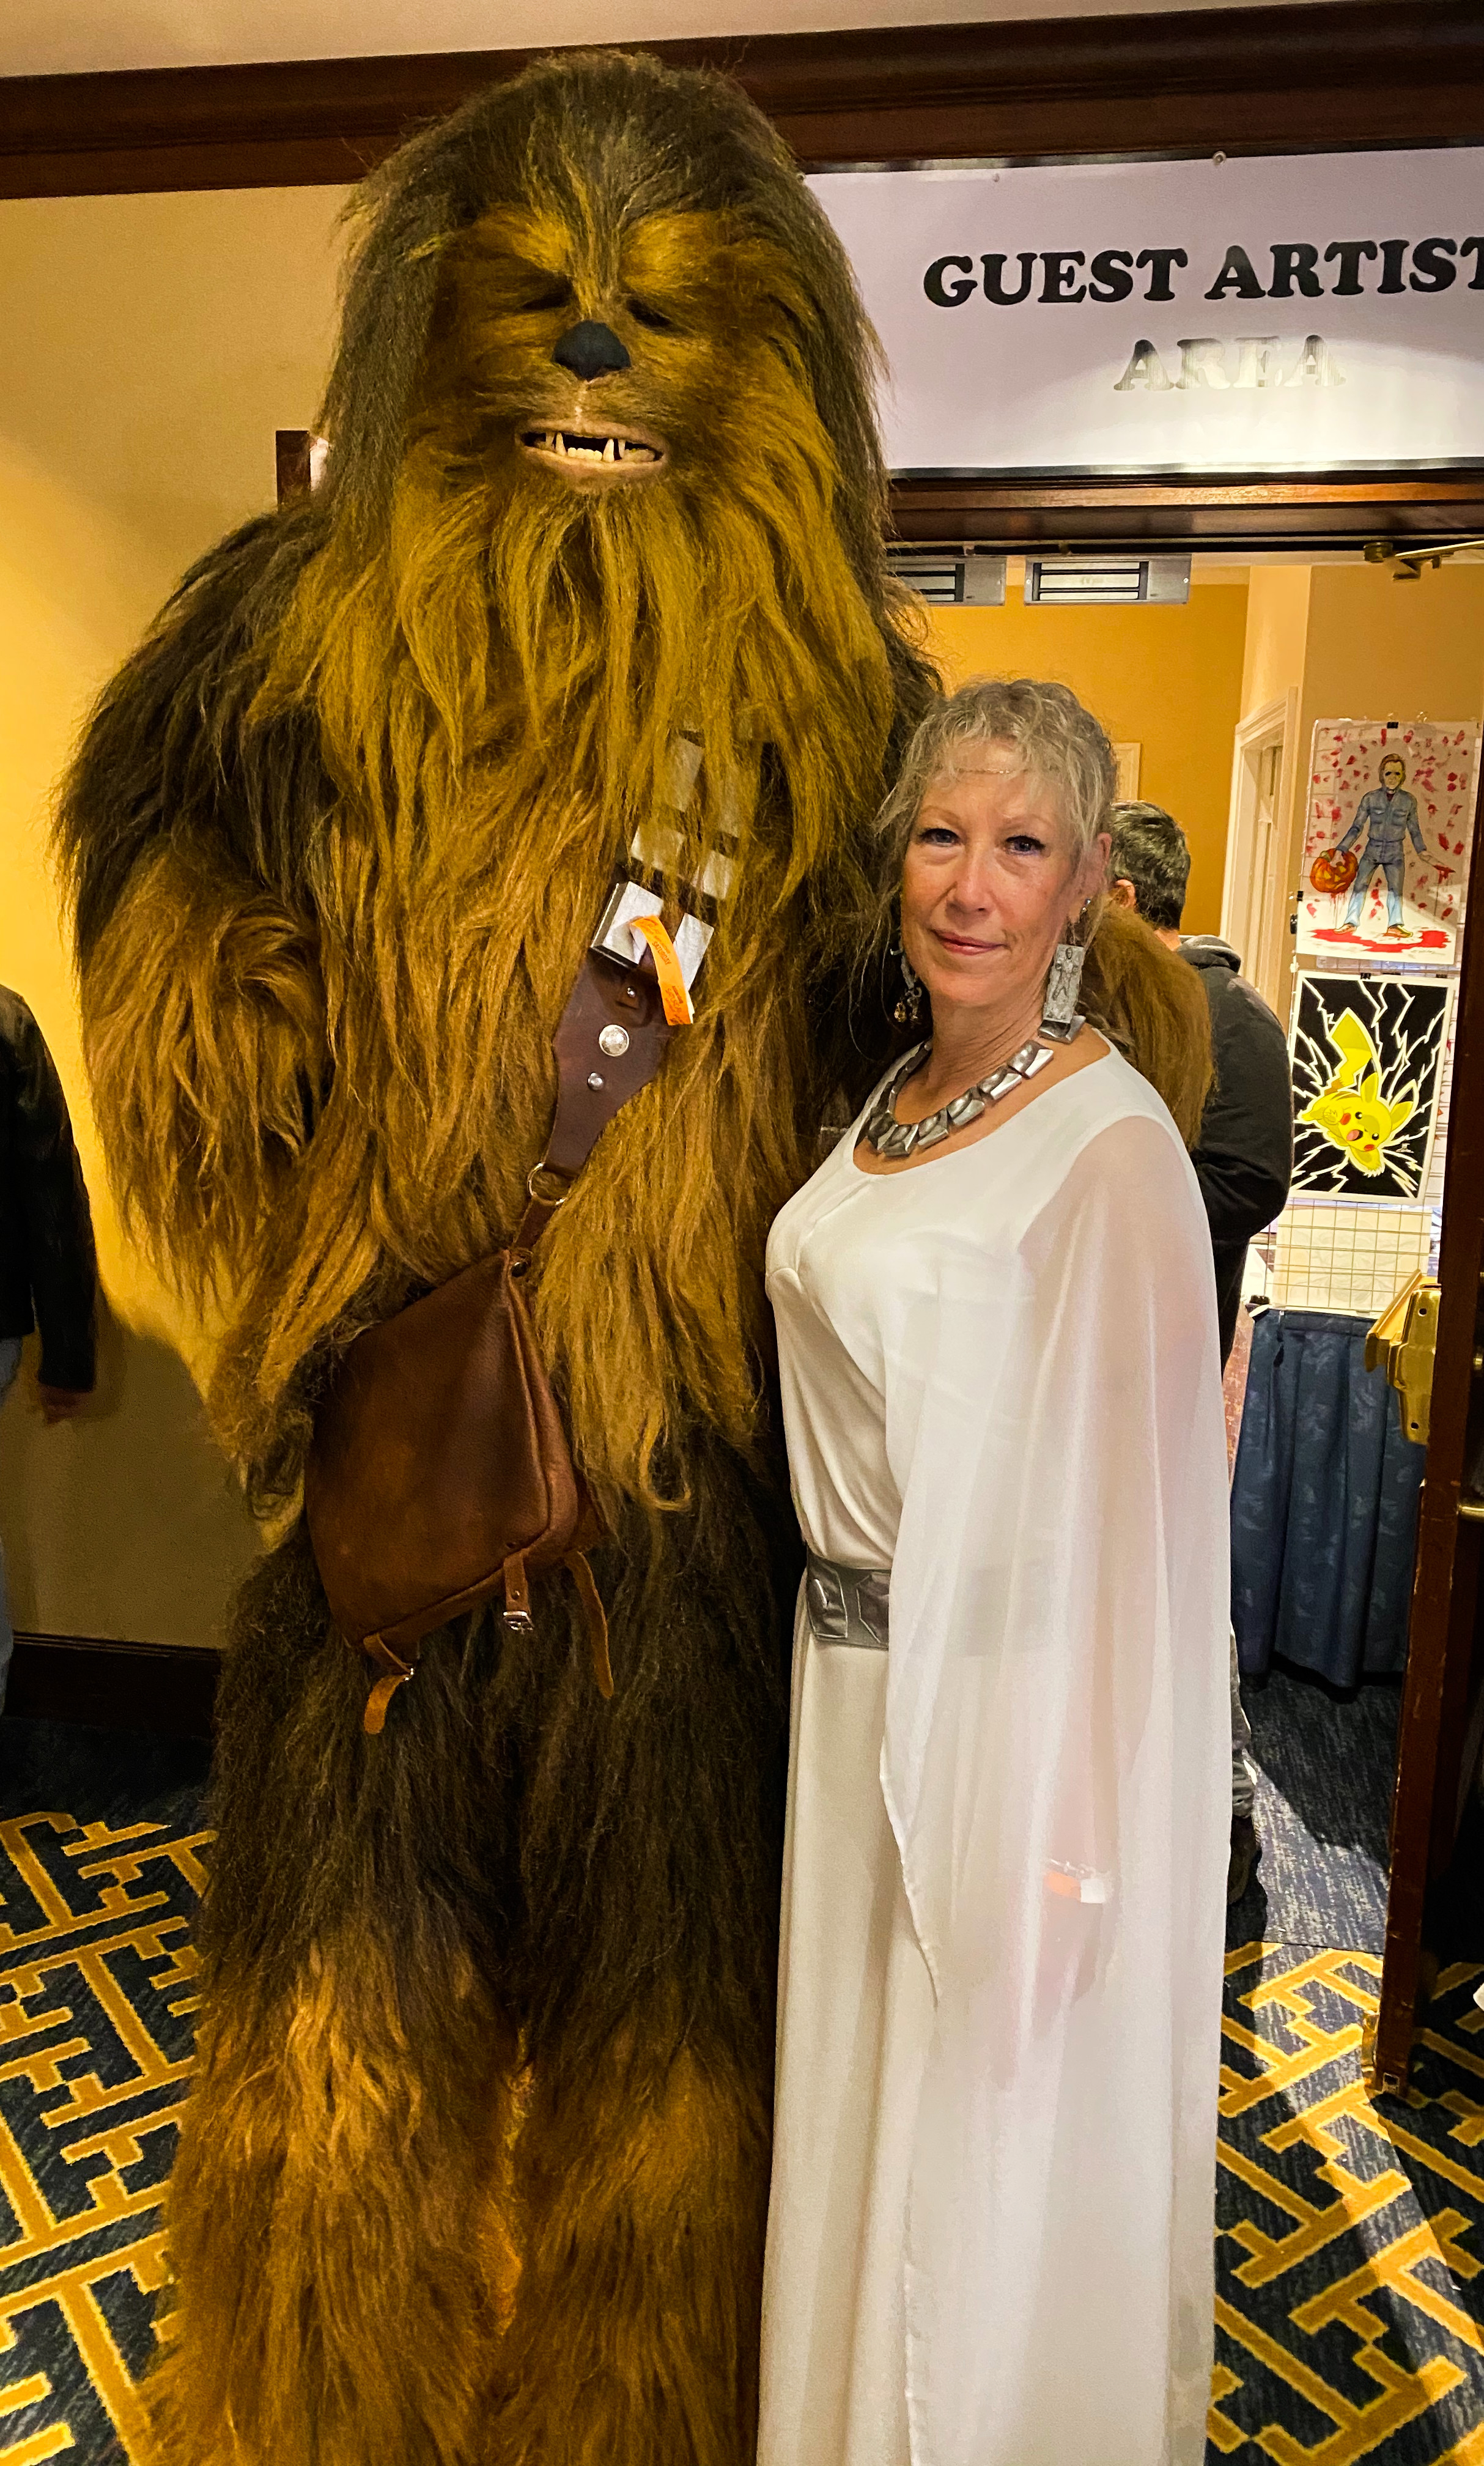 Chewbacca and Princess Leia.